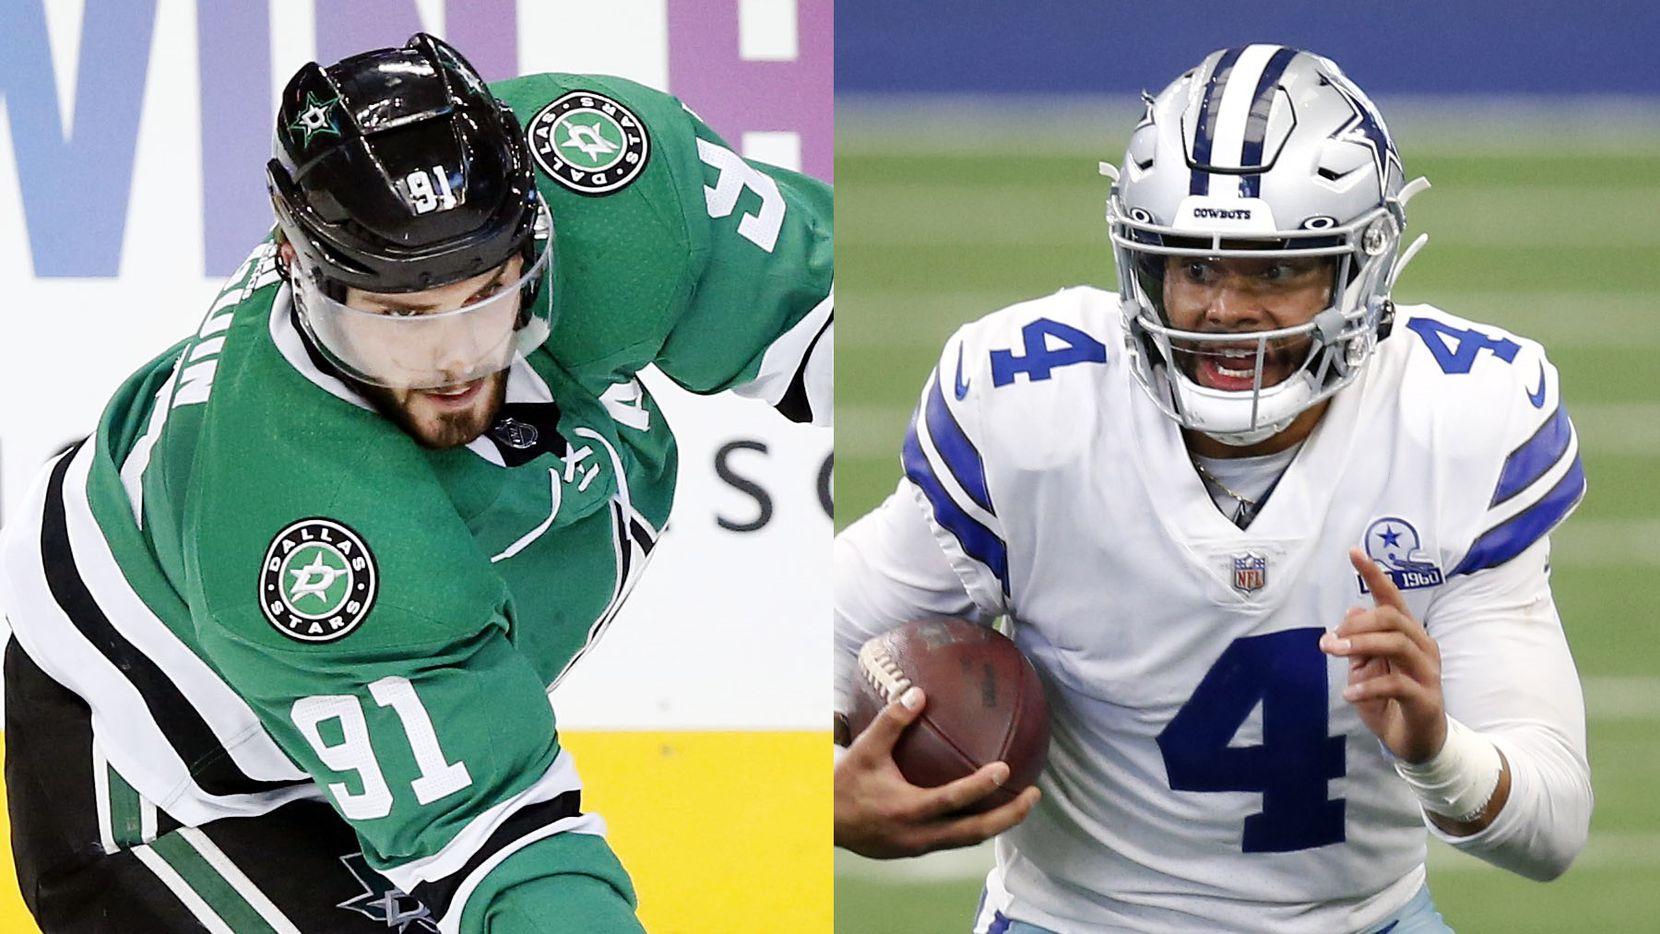 From L to R: Stars forward Tyler Seguin, Cowboys quarterback Dak Prescott